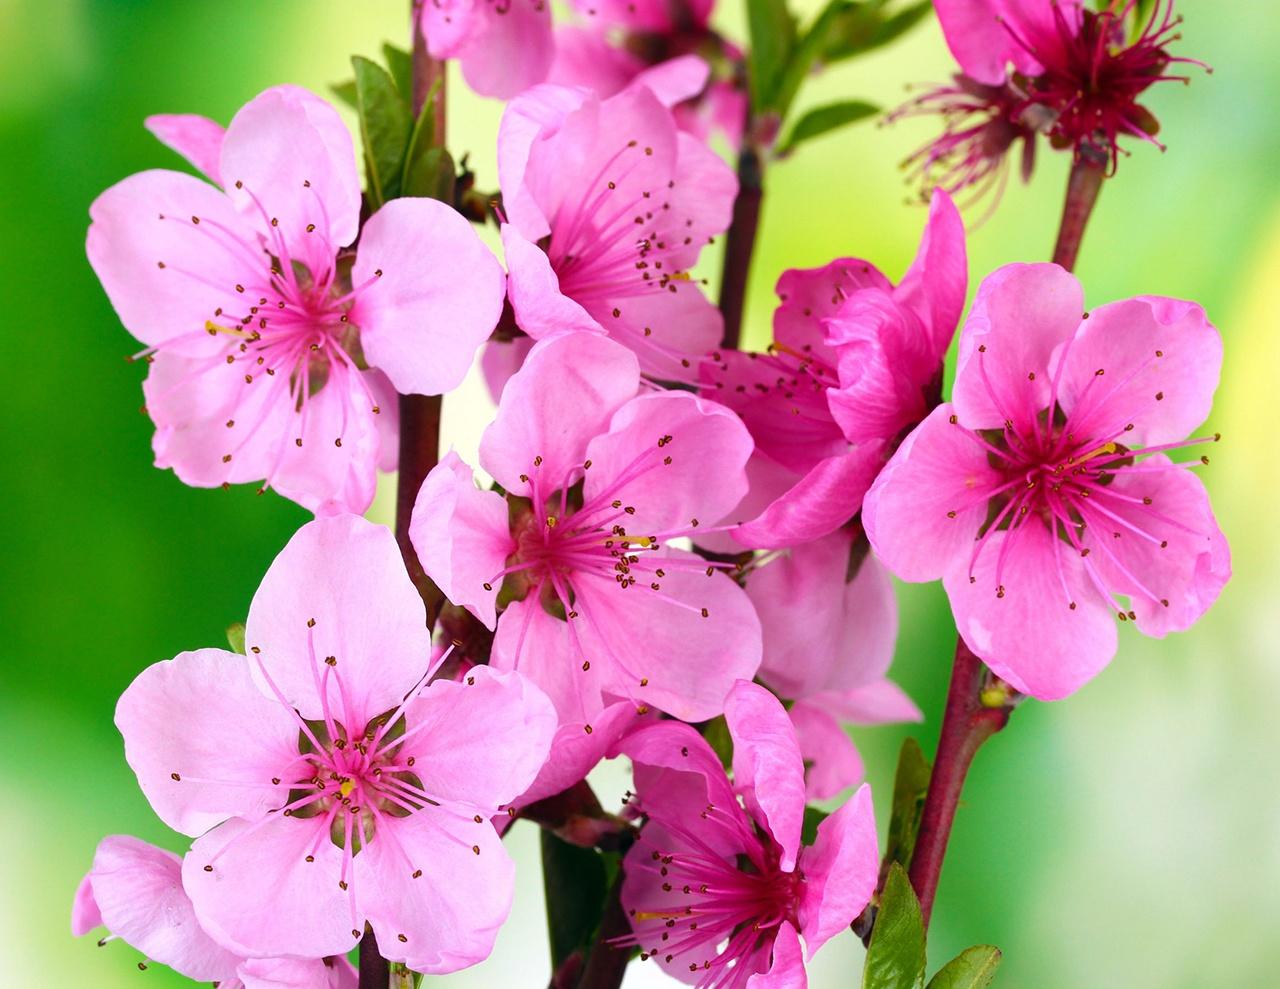 peach_tree_blossom